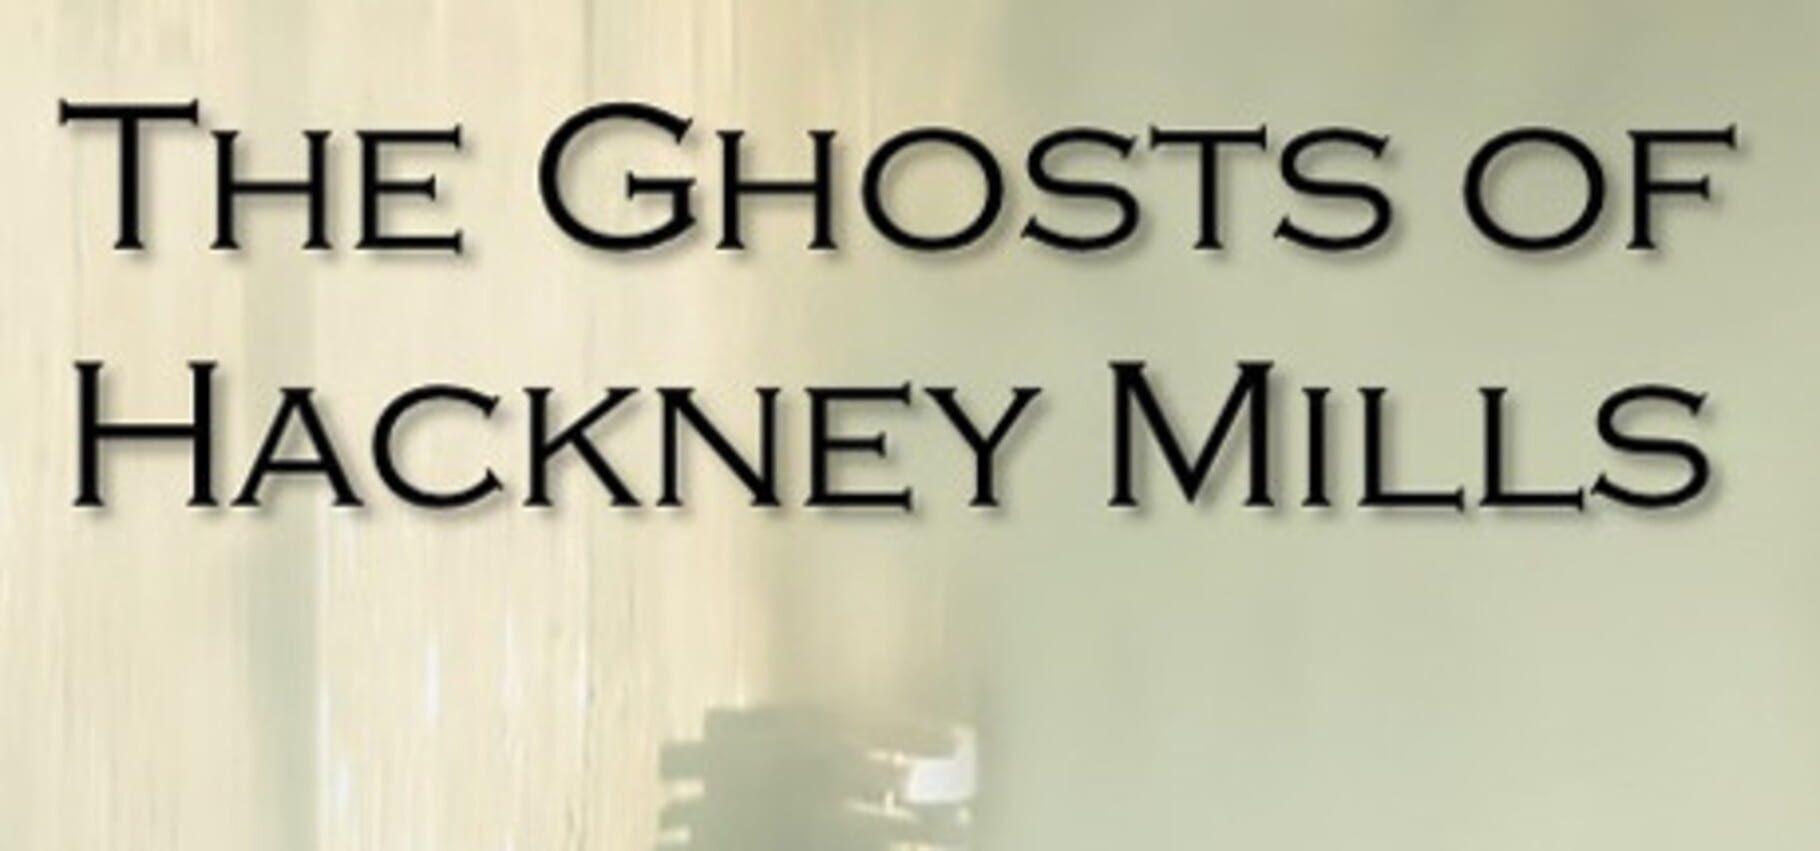 buy The Ghosts of Hackney Mills cd key for all platform